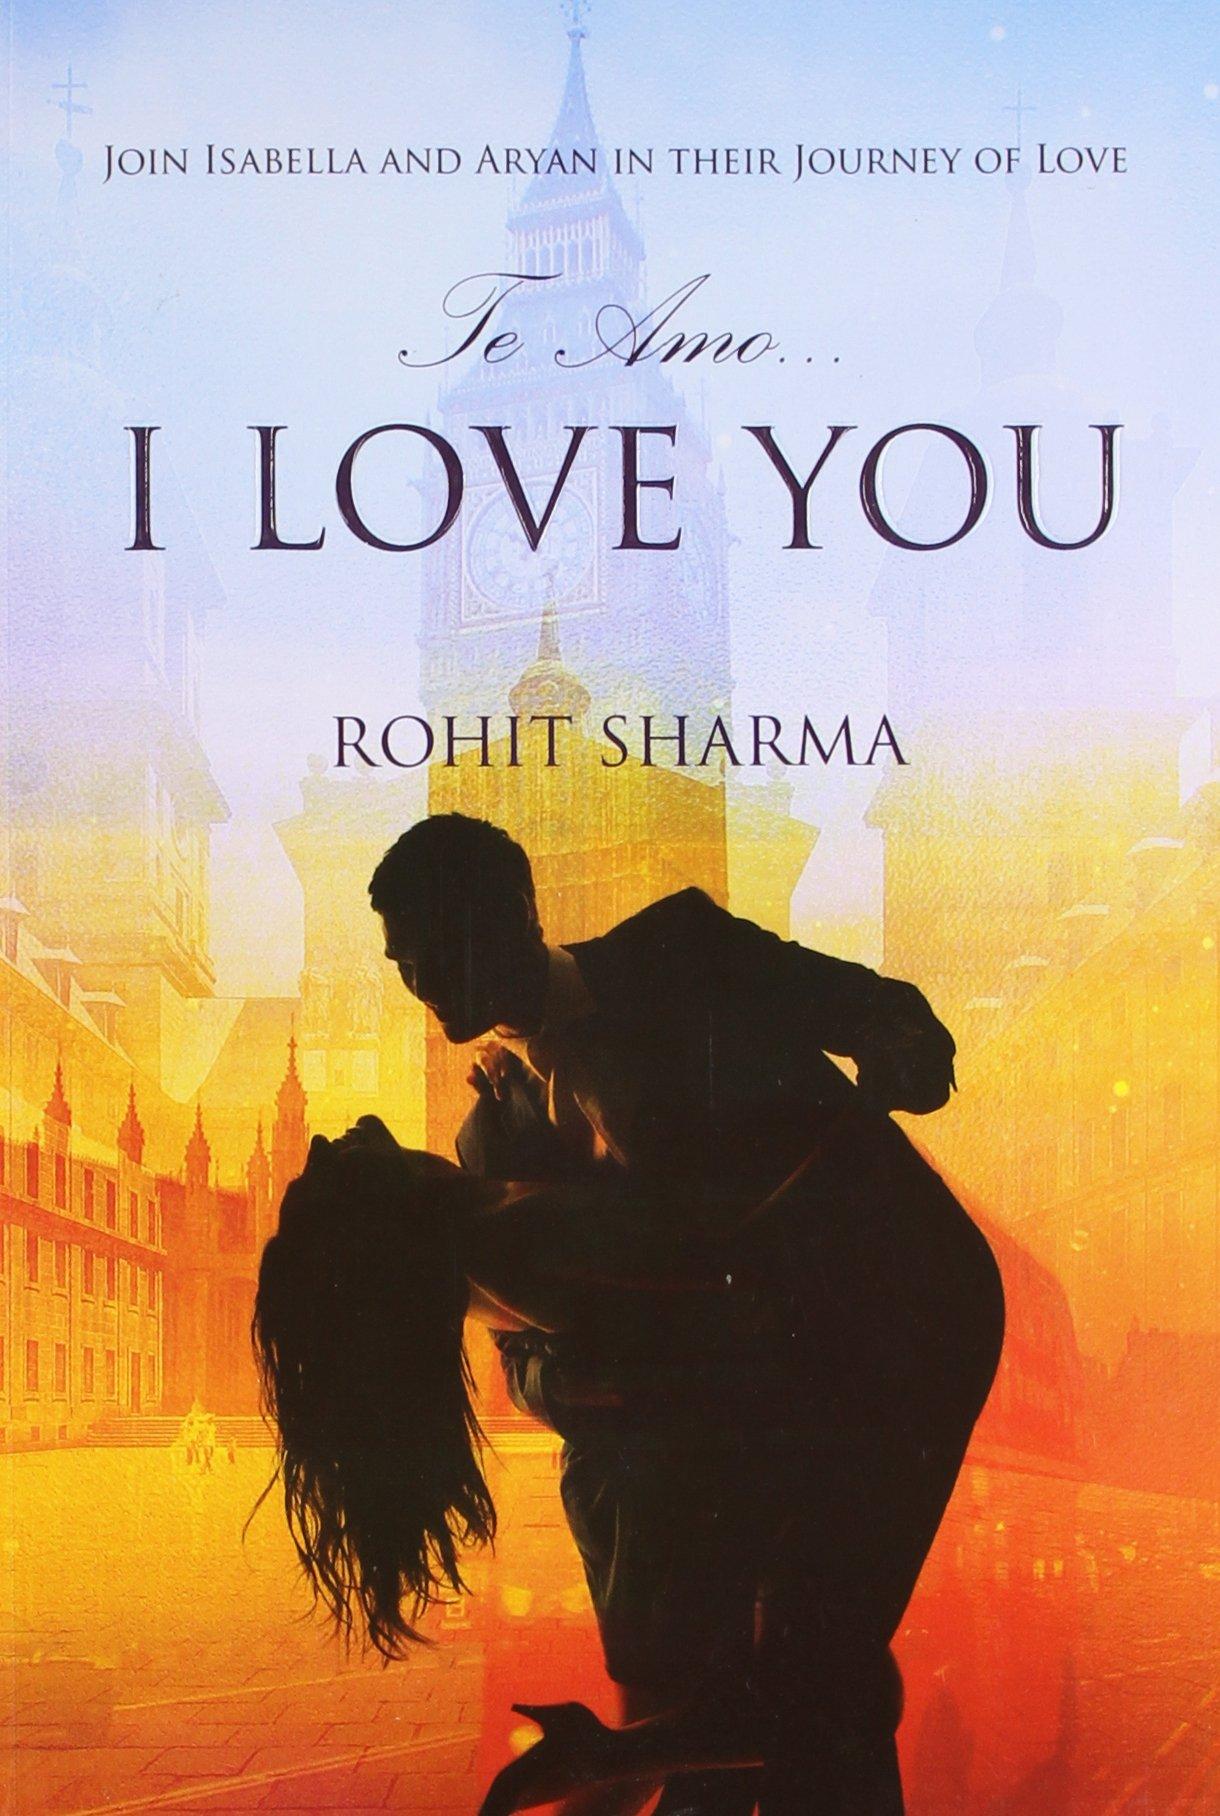 i love you novel by rohit sharma free download